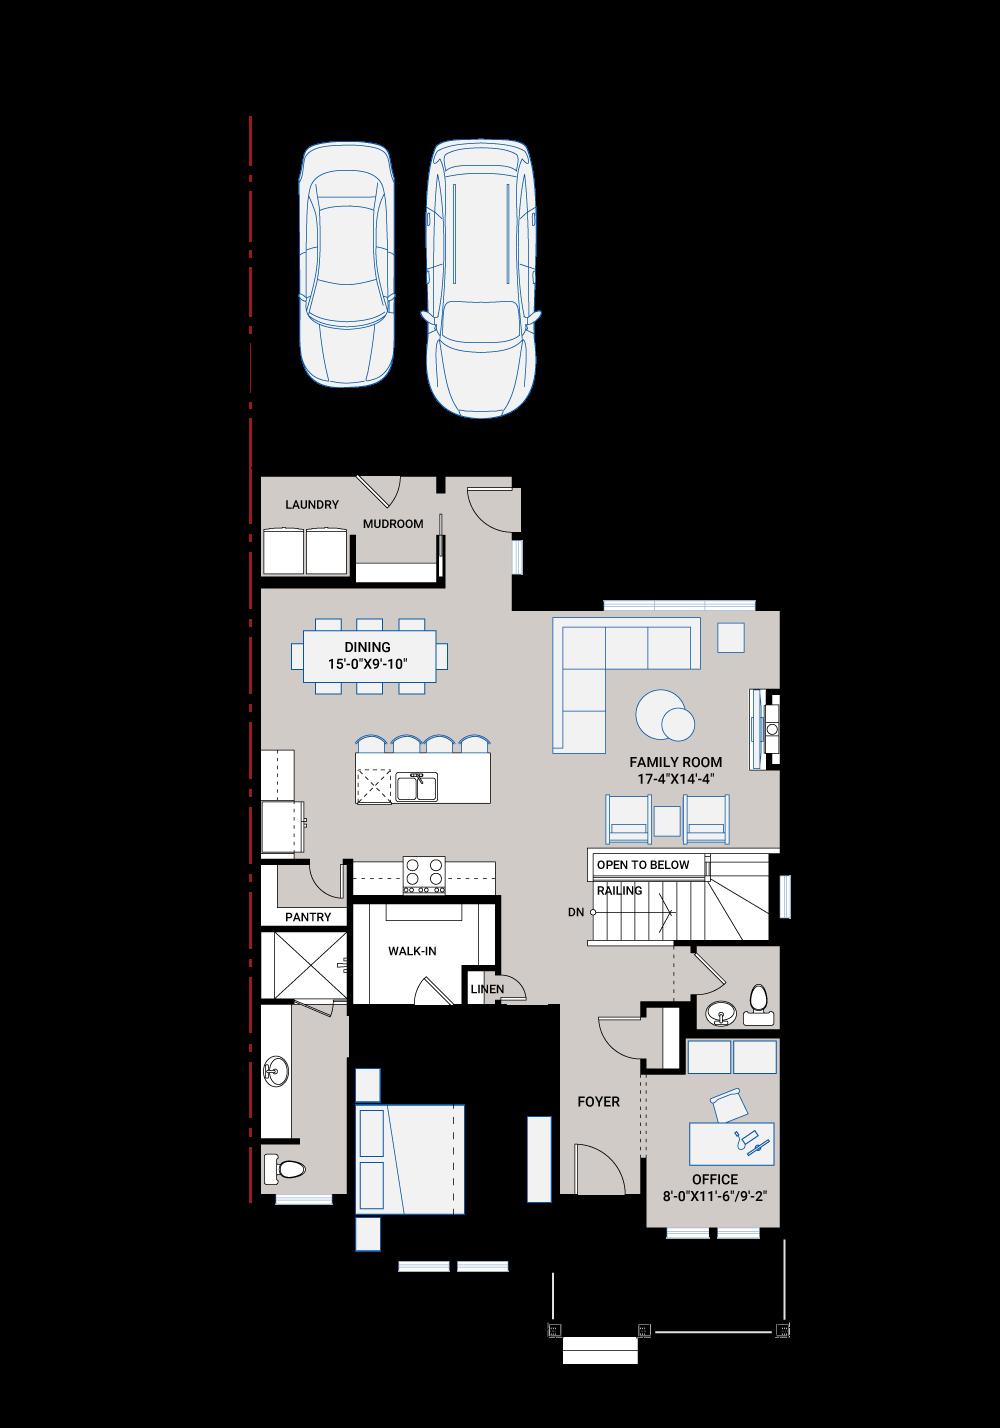 Base floorplan of LORETTE AP - AP1 FARMHOUSE - 1,387 sqft, 1 Bedroom, 1.5 - 2.5 Bathroom - Cardel Homes Calgary